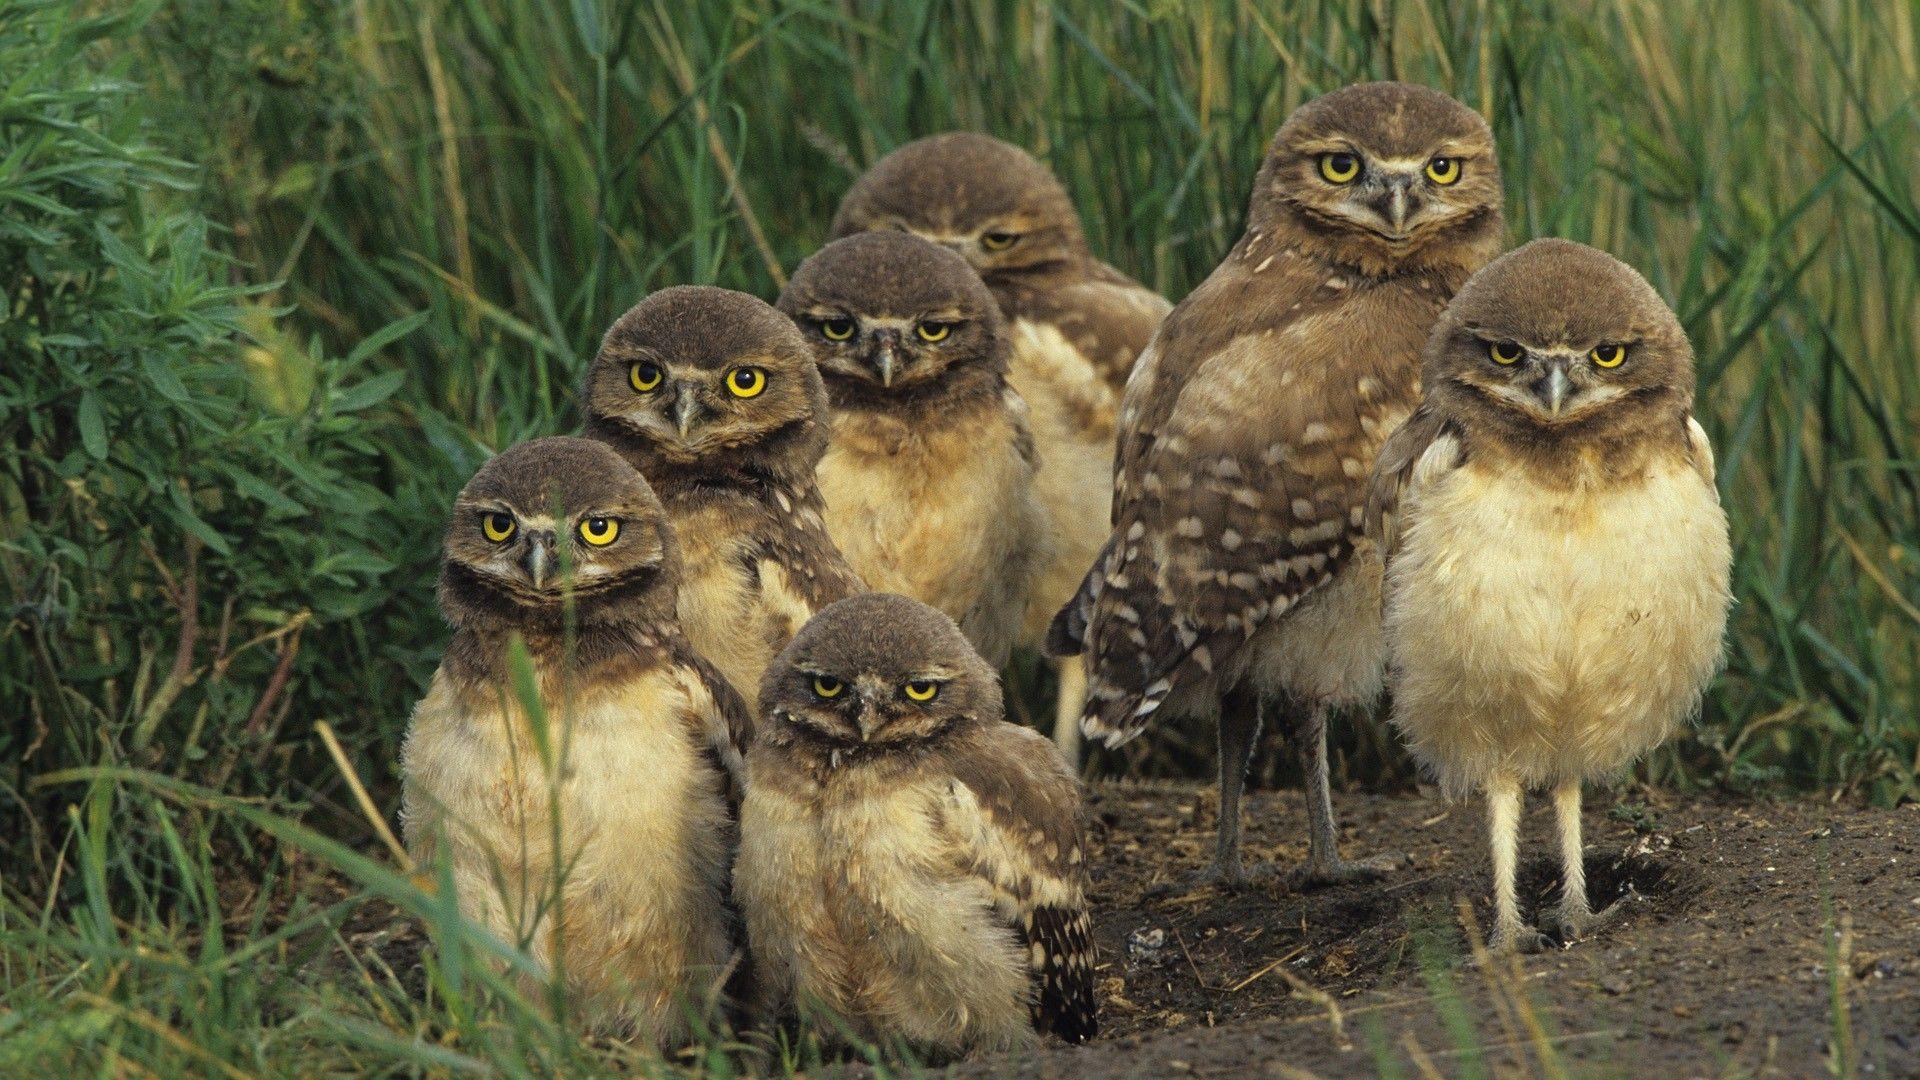 birds wild life birds wildlife owls baby birds 1920x1080 hdbirds wild life birds wildlife owls baby birds 1920x1080 hd wallpaper free downloads